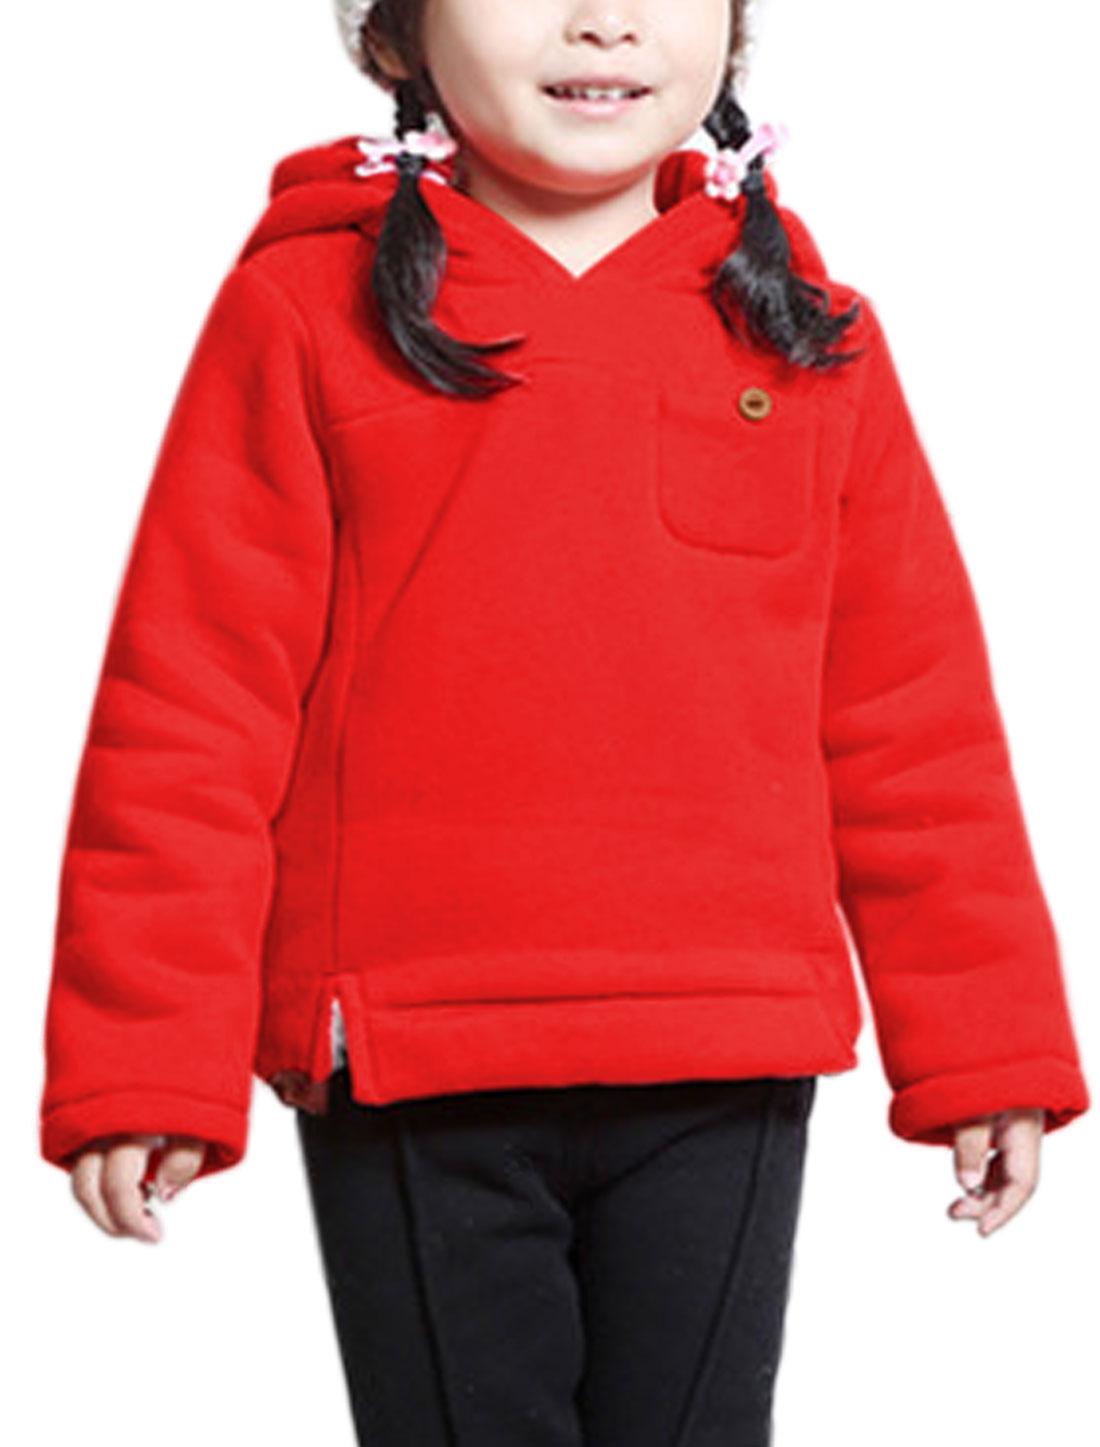 Girls Side Split Soft Lining Hooded Sweatshirt Red 10